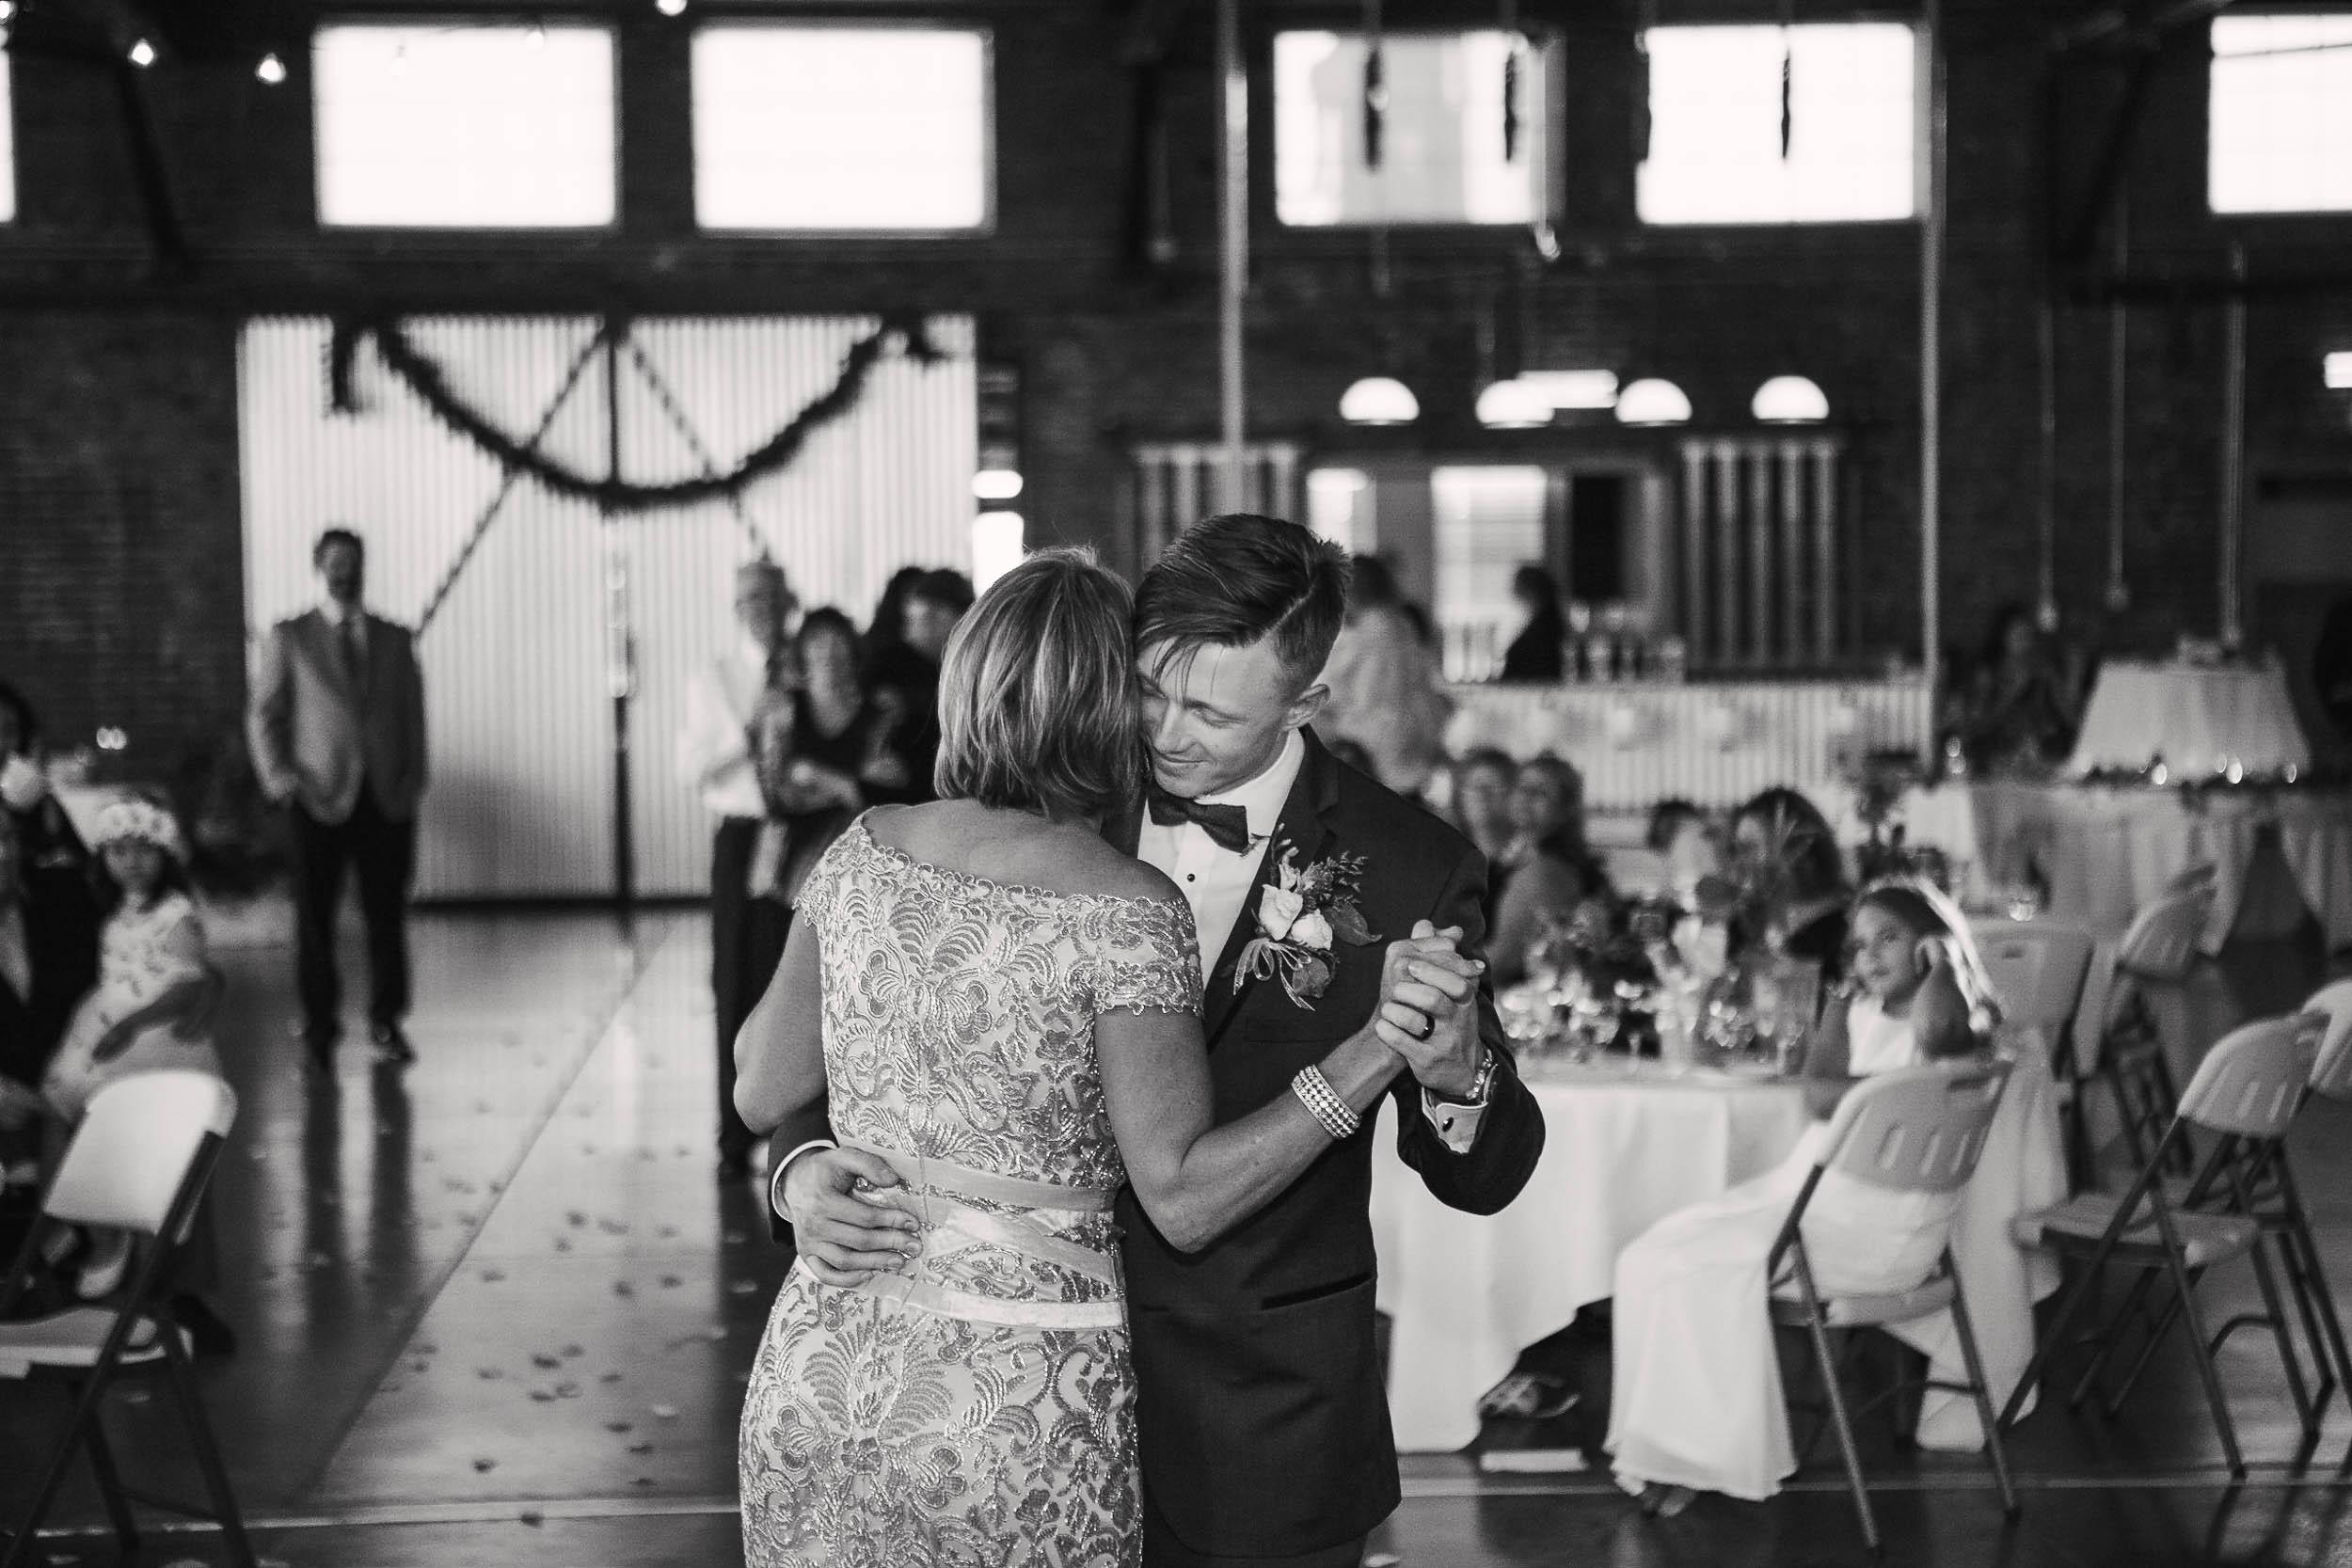 KyleLovesTori-Casper-Wyoming-Wedding-131.jpg